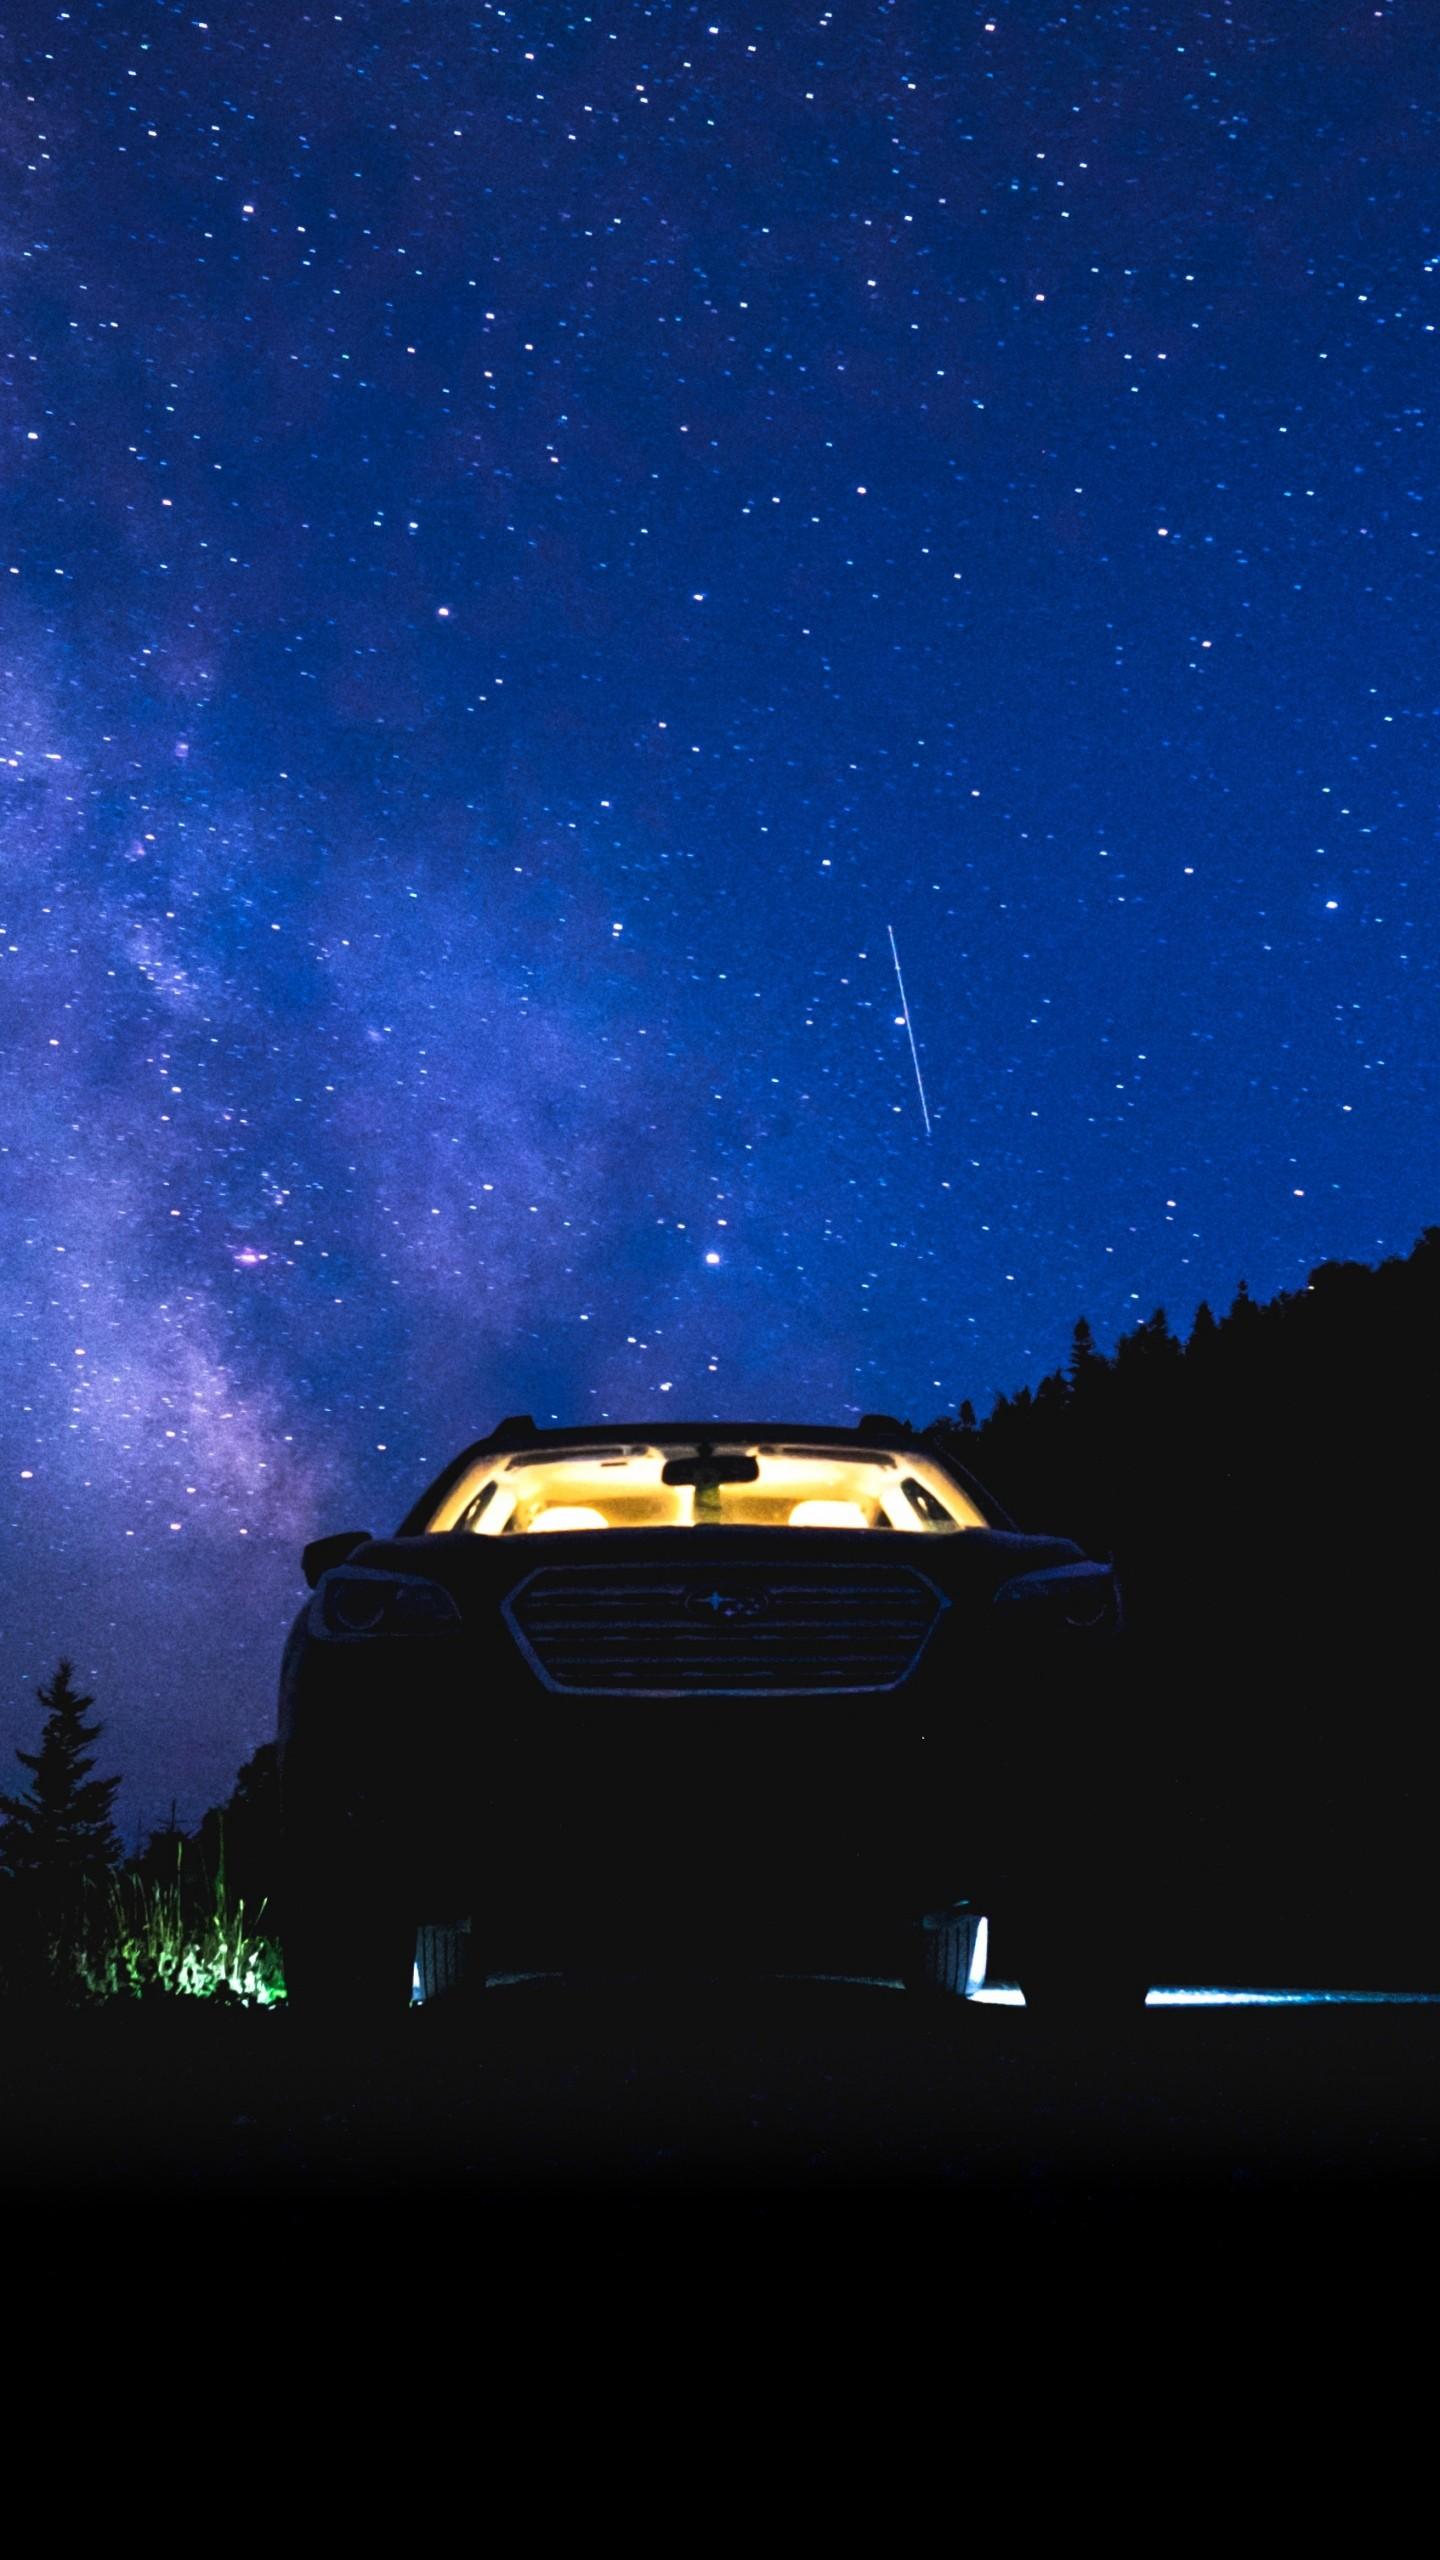 Simple Wallpaper Night Car - Starry-Sky-Night-Car-Wallpaper-1440x2560  HD.jpg